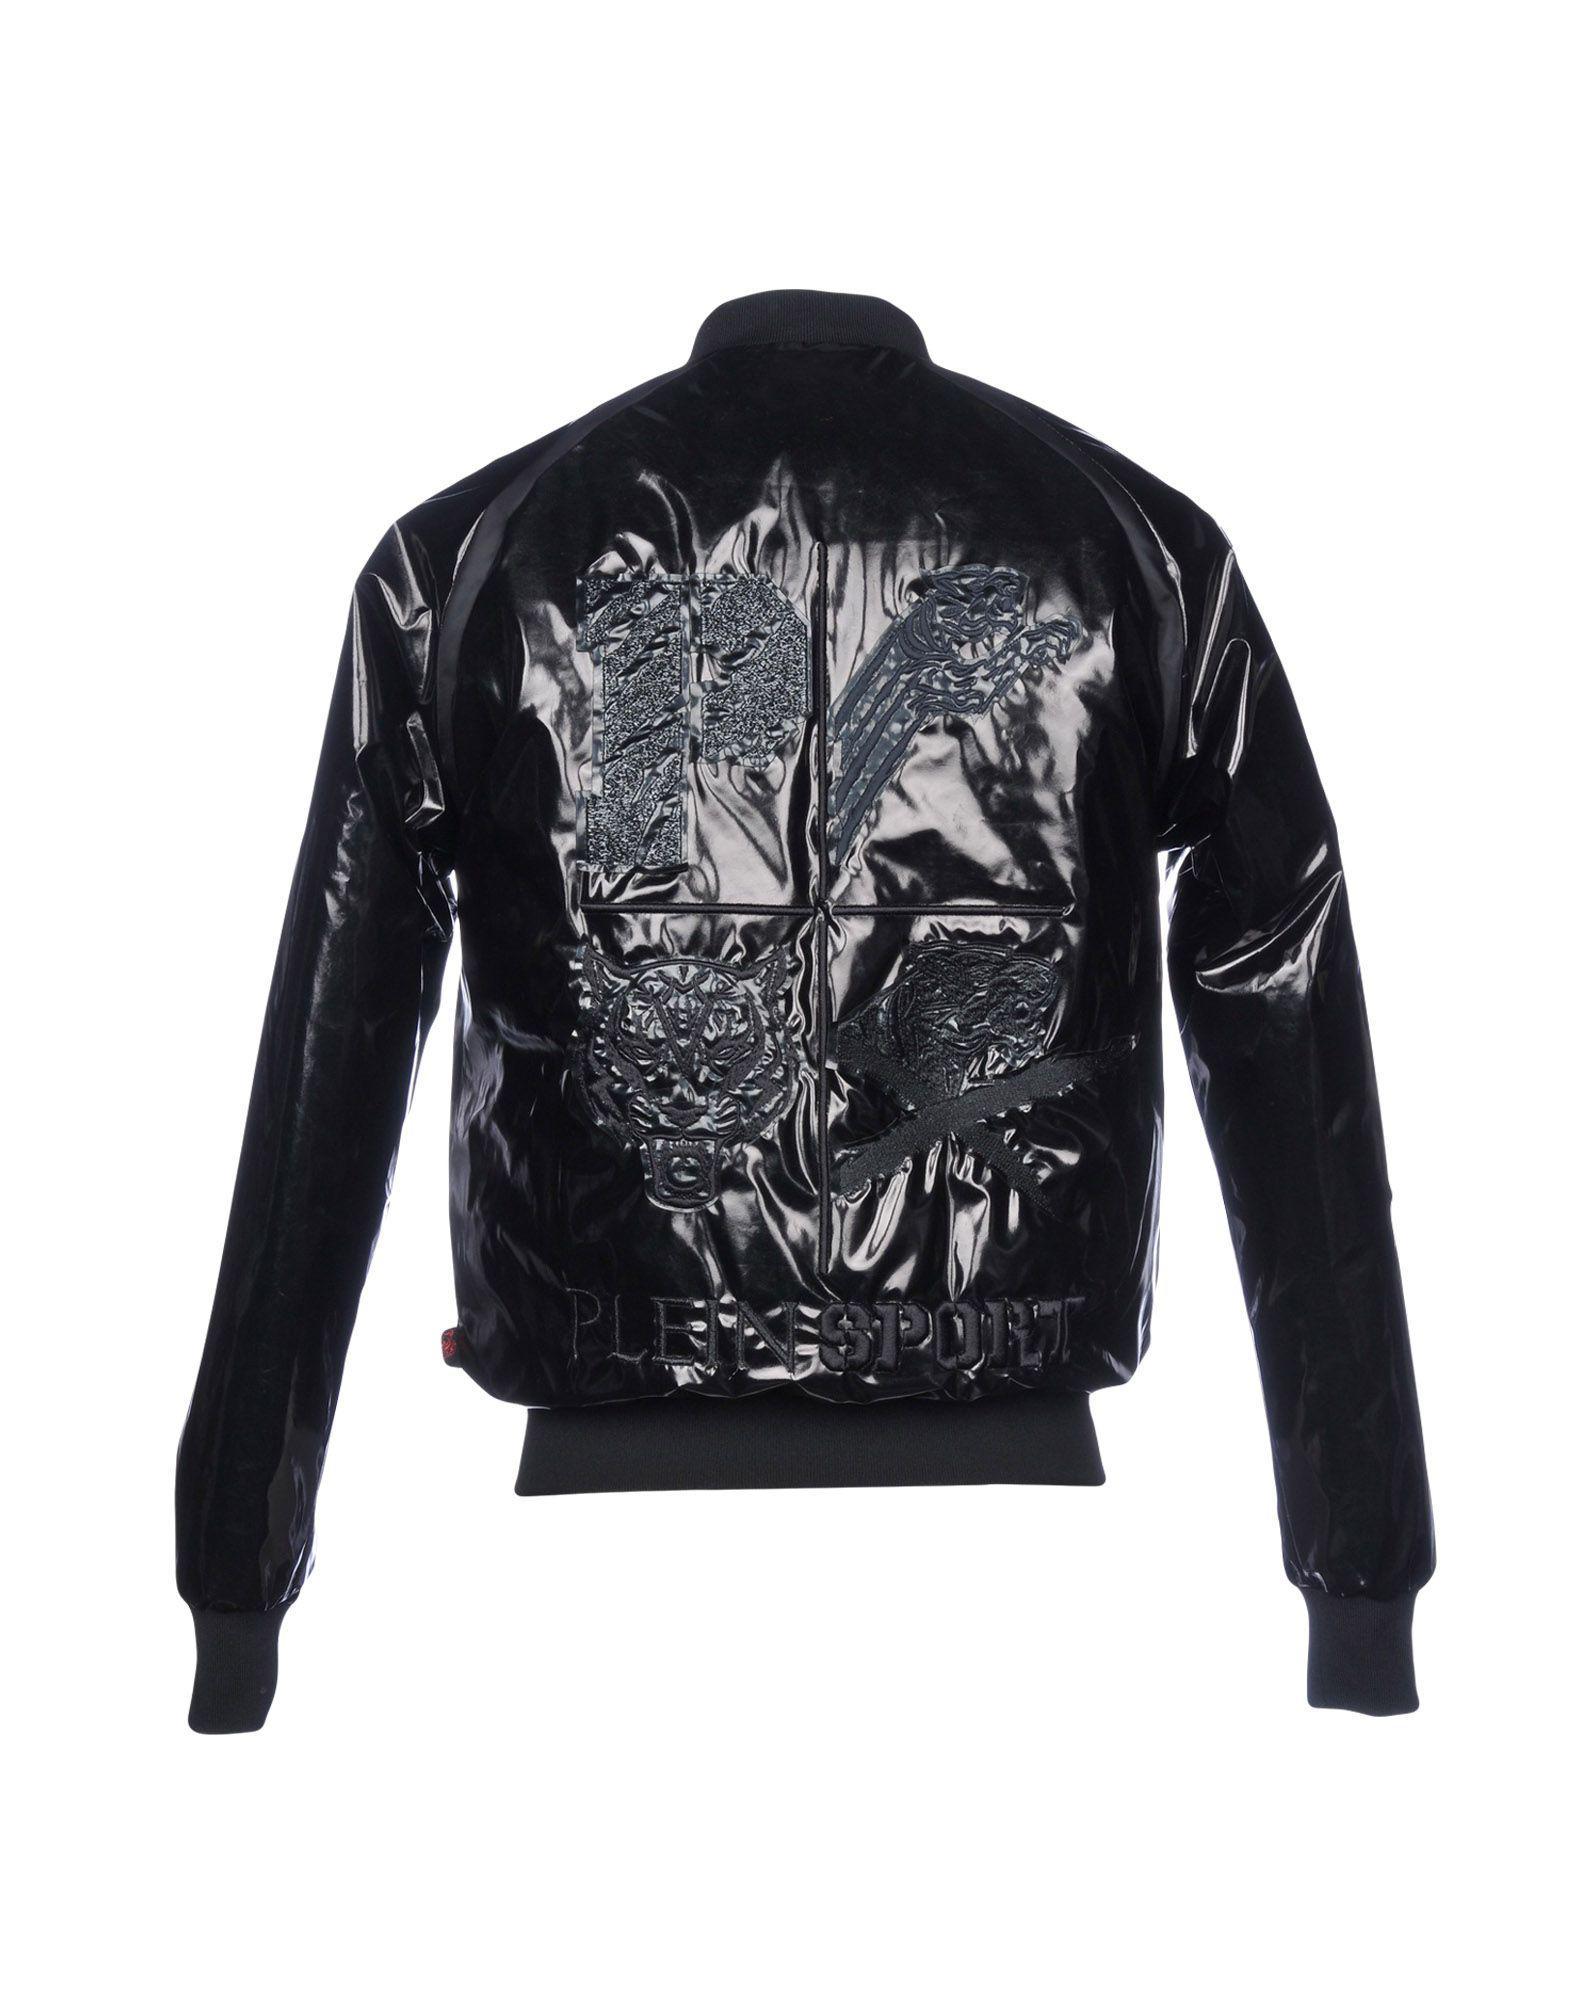 75102e3c55 Philipp Plein Synthetic Down Jacket in Black for Men - Lyst